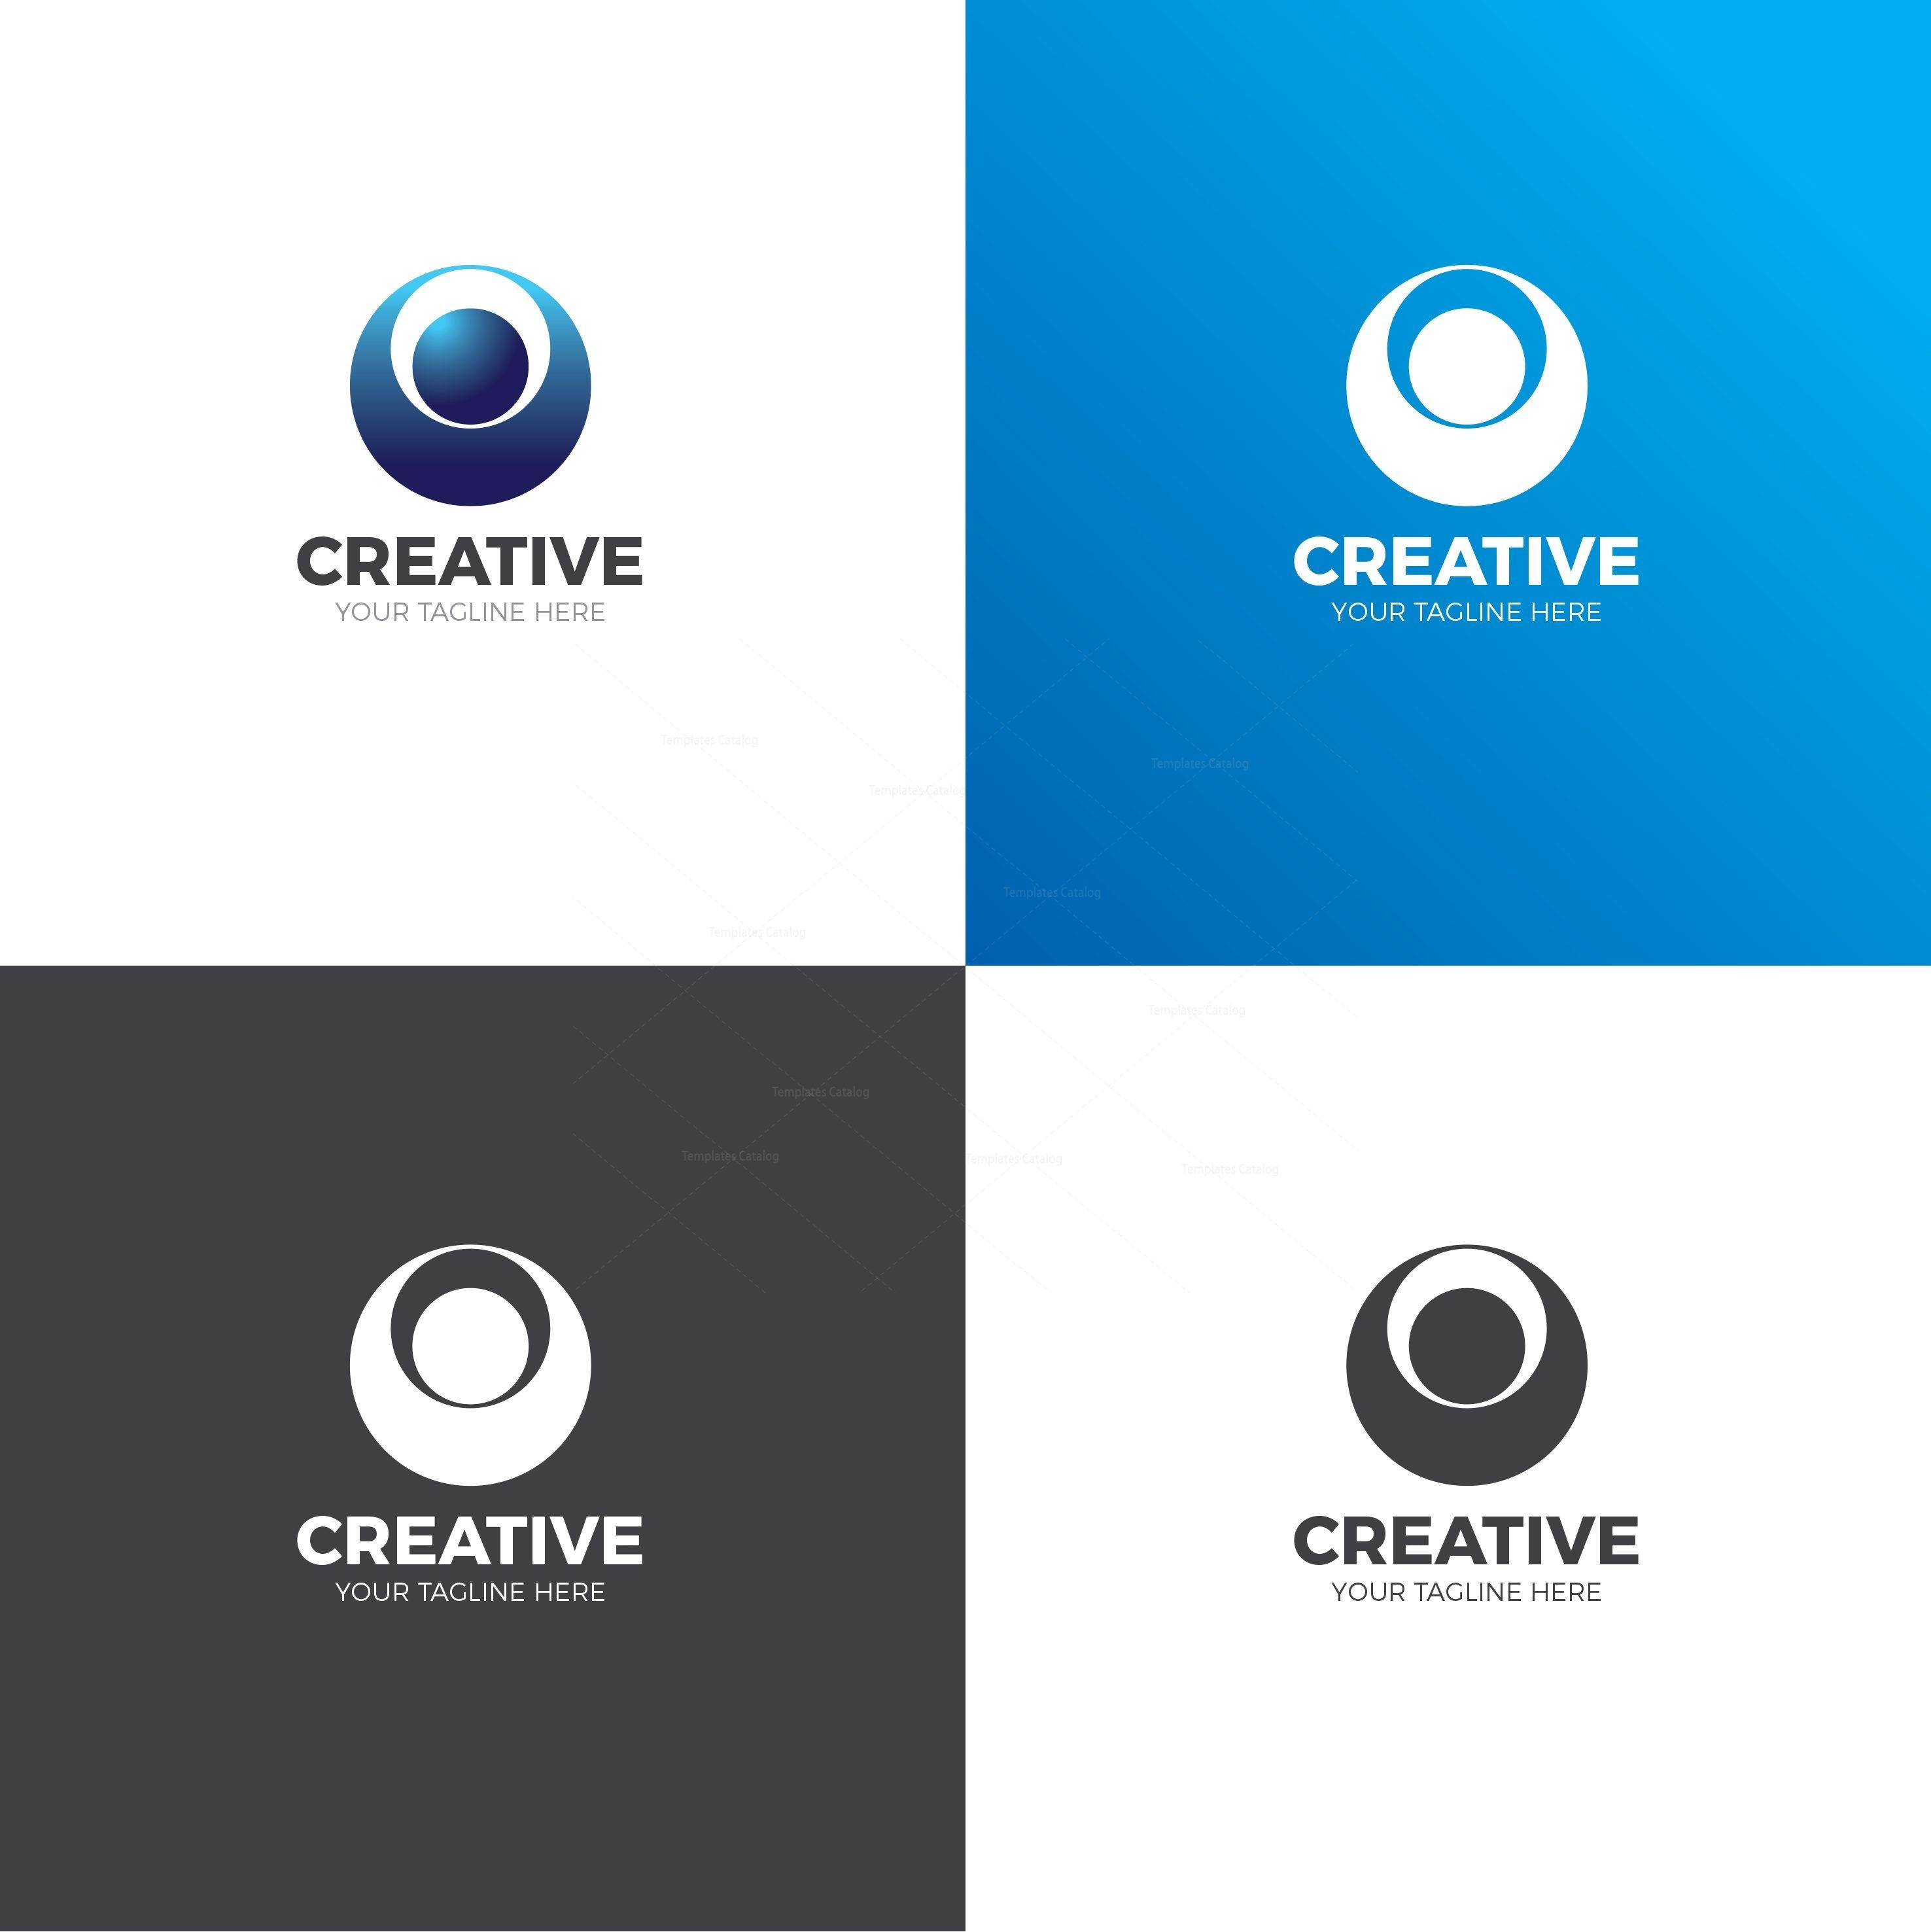 creative company logo design template 001708 template